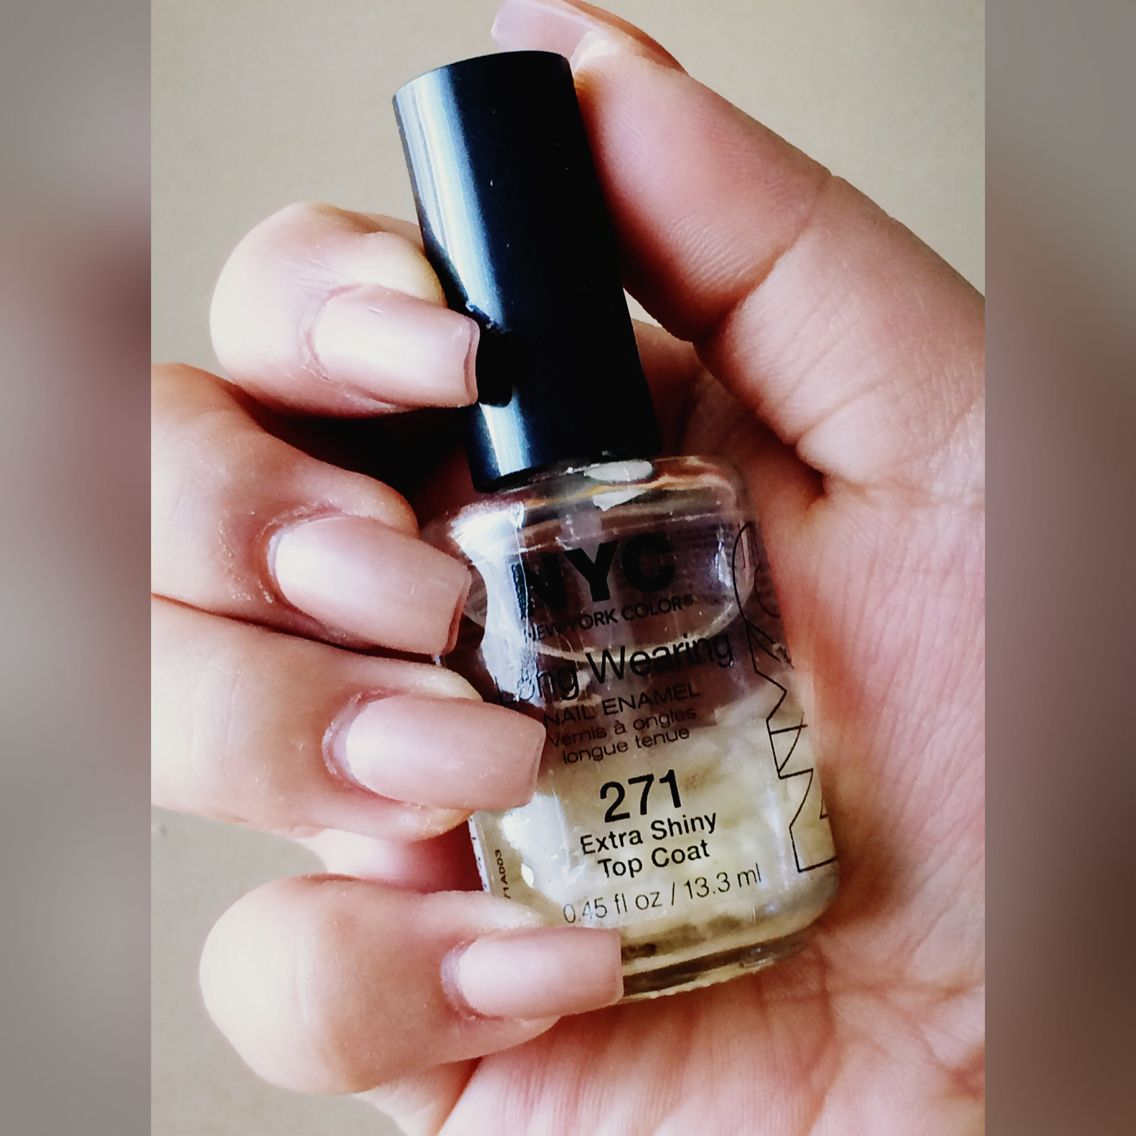 https://m.youtube.com/watch?v=_v4QRAF-KMk Garlic Nail Polish for ...